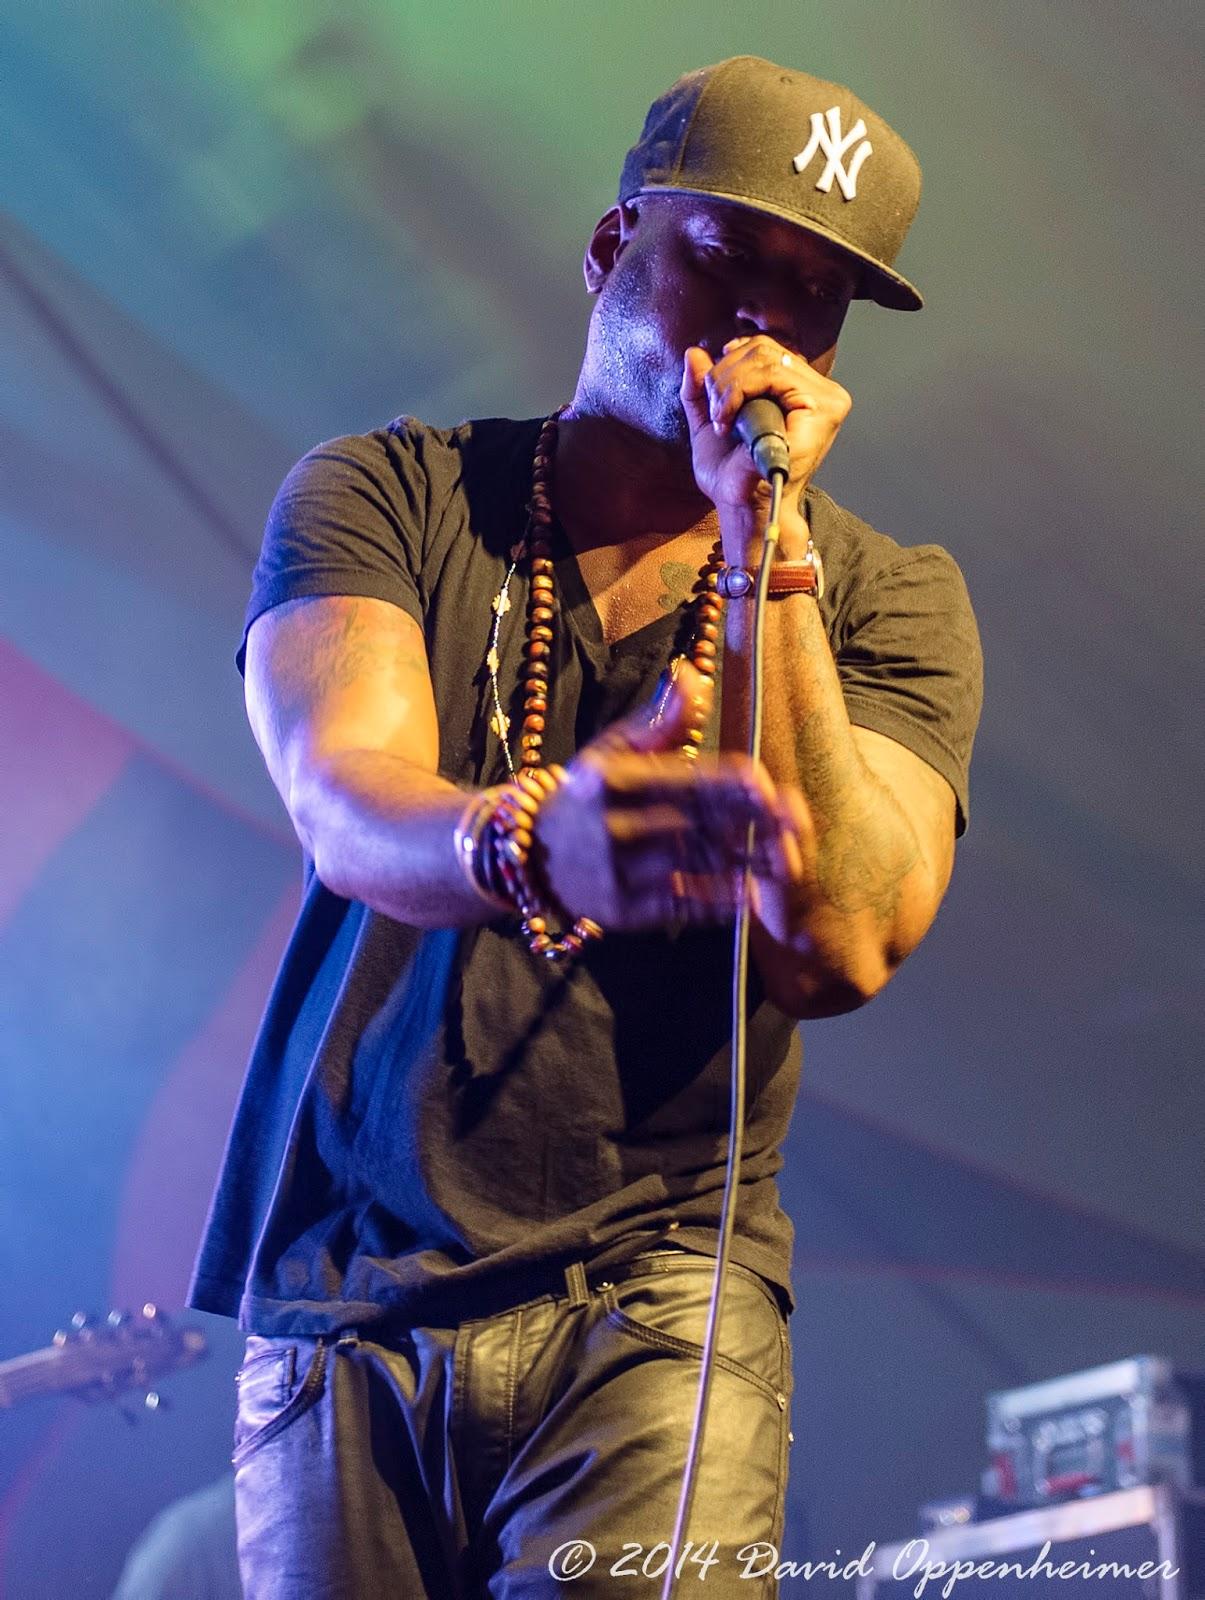 Talib Kweli Performing at LEAF Festival